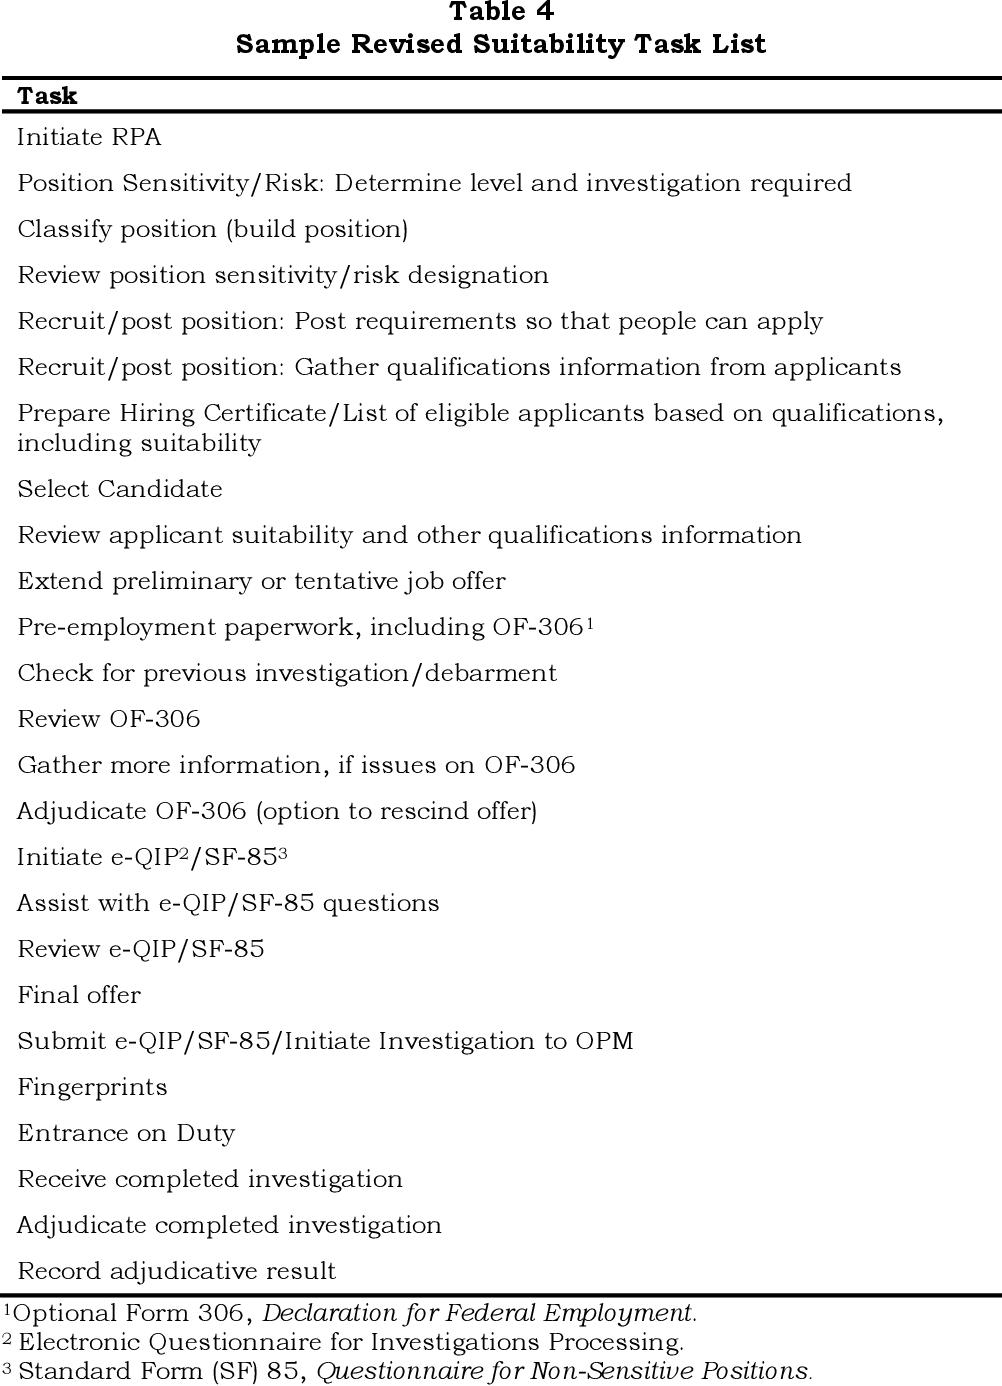 PDF] Baseline Suitability Analysis - Semantic Scholar